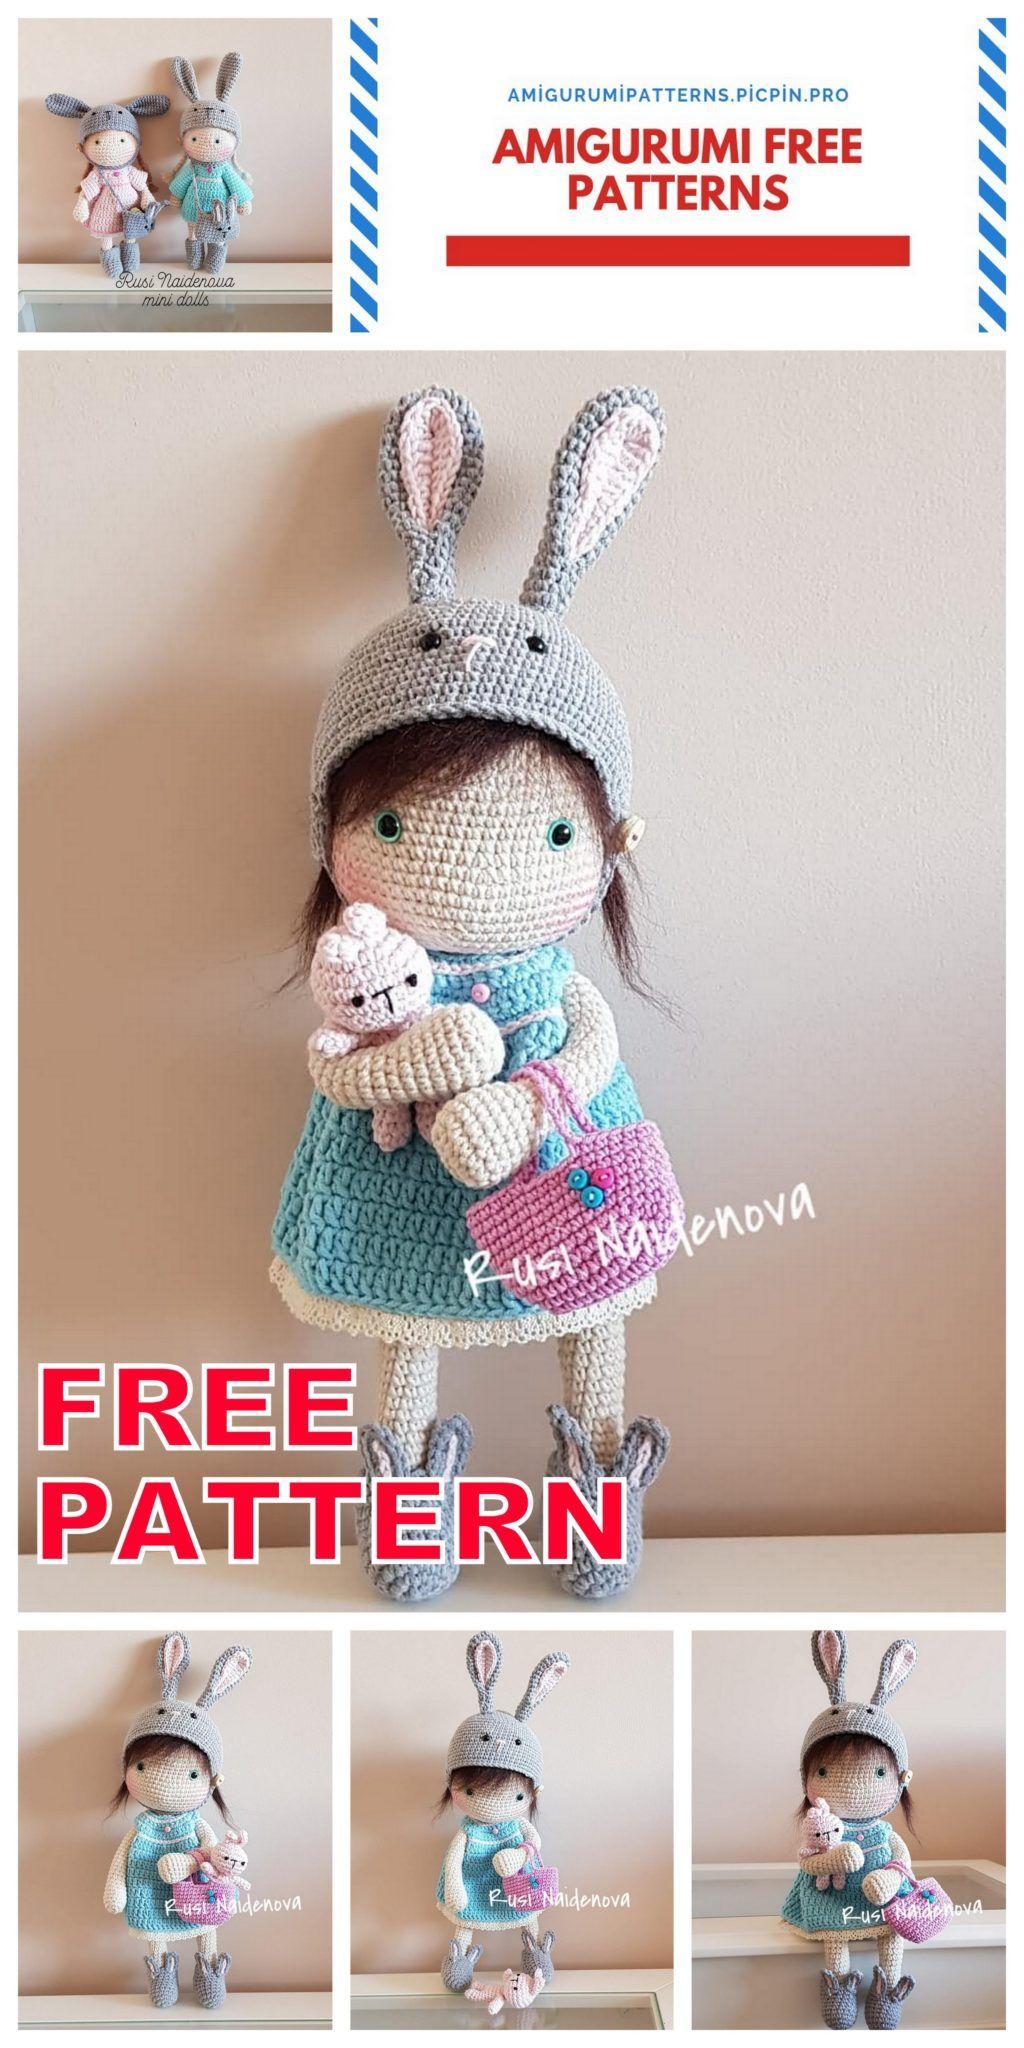 Amigurumi Tiny Bear Crochet Free Pattern - Crochet & Knitting | 2048x1024